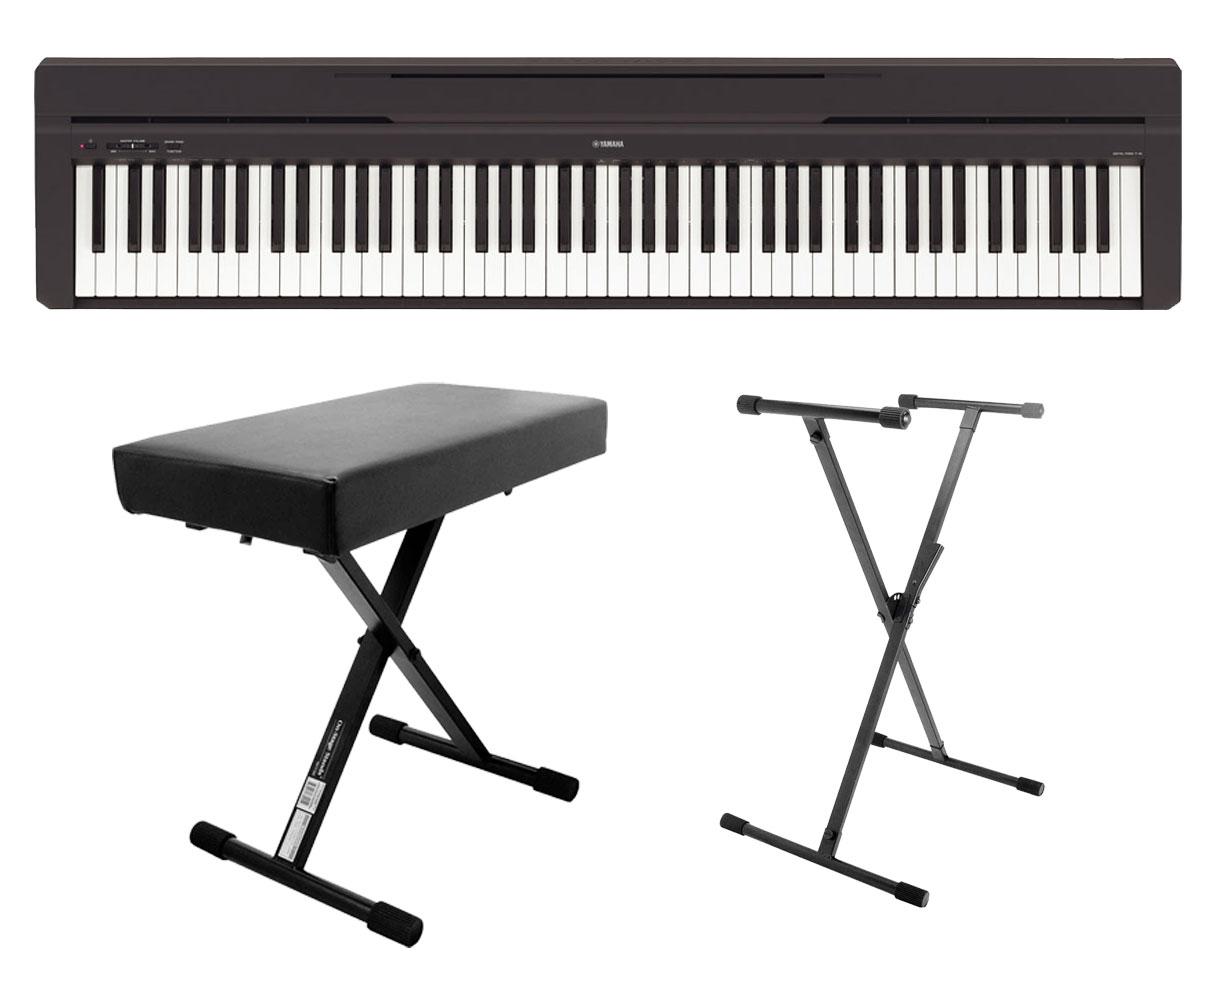 yamaha p45b hammer action digital piano keyboard stand bench ebay. Black Bedroom Furniture Sets. Home Design Ideas